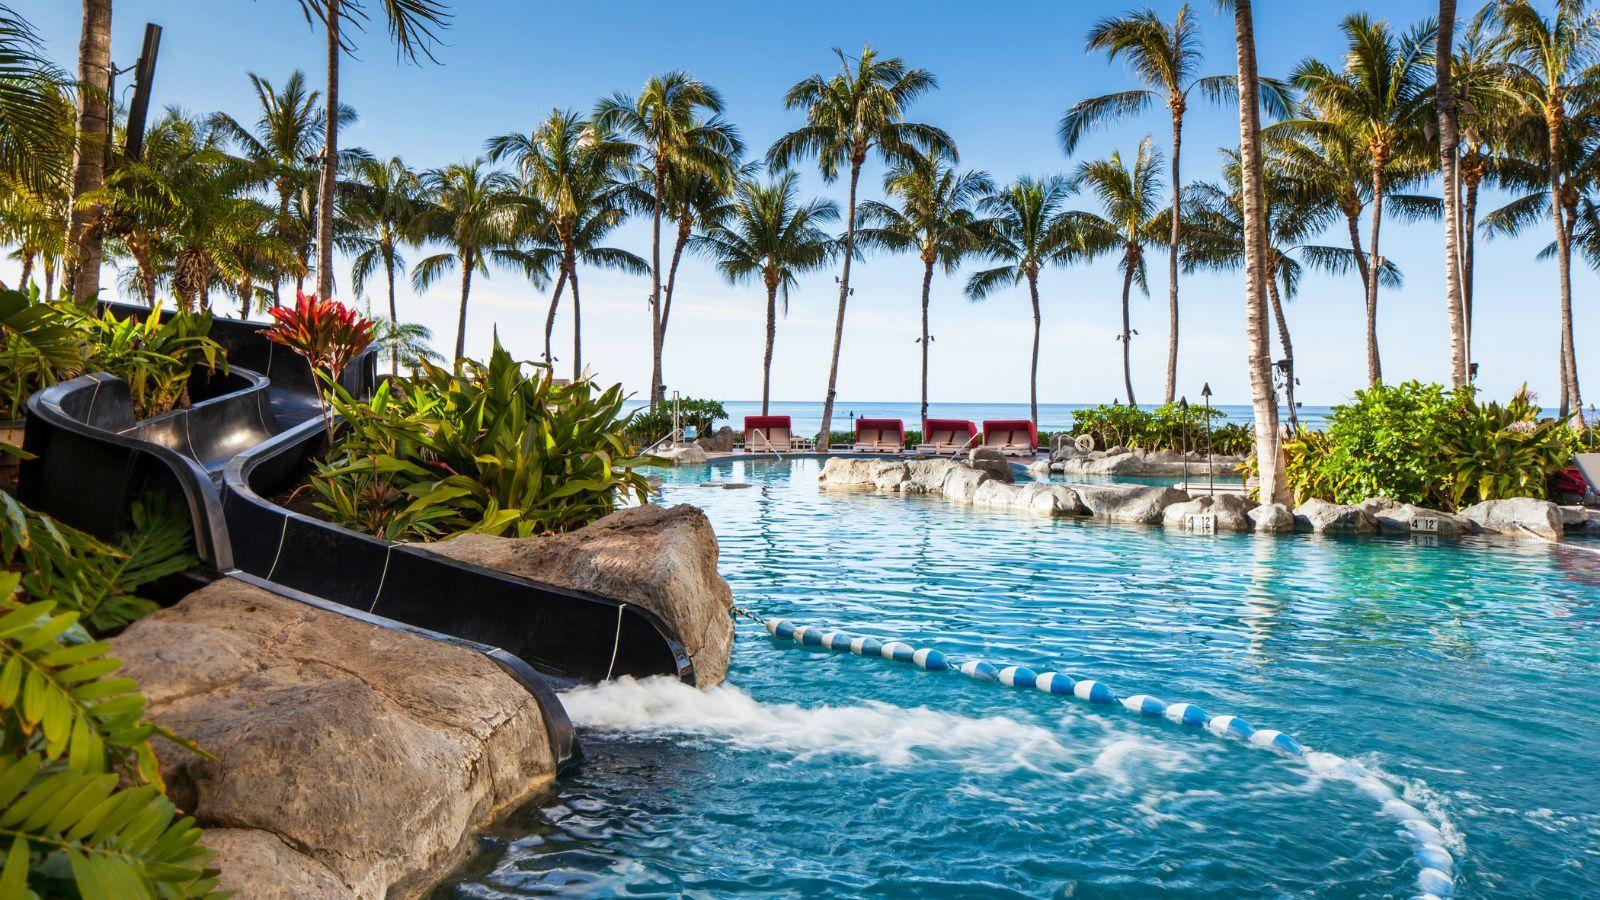 Sheraton Waikiki Beach Pool Slide